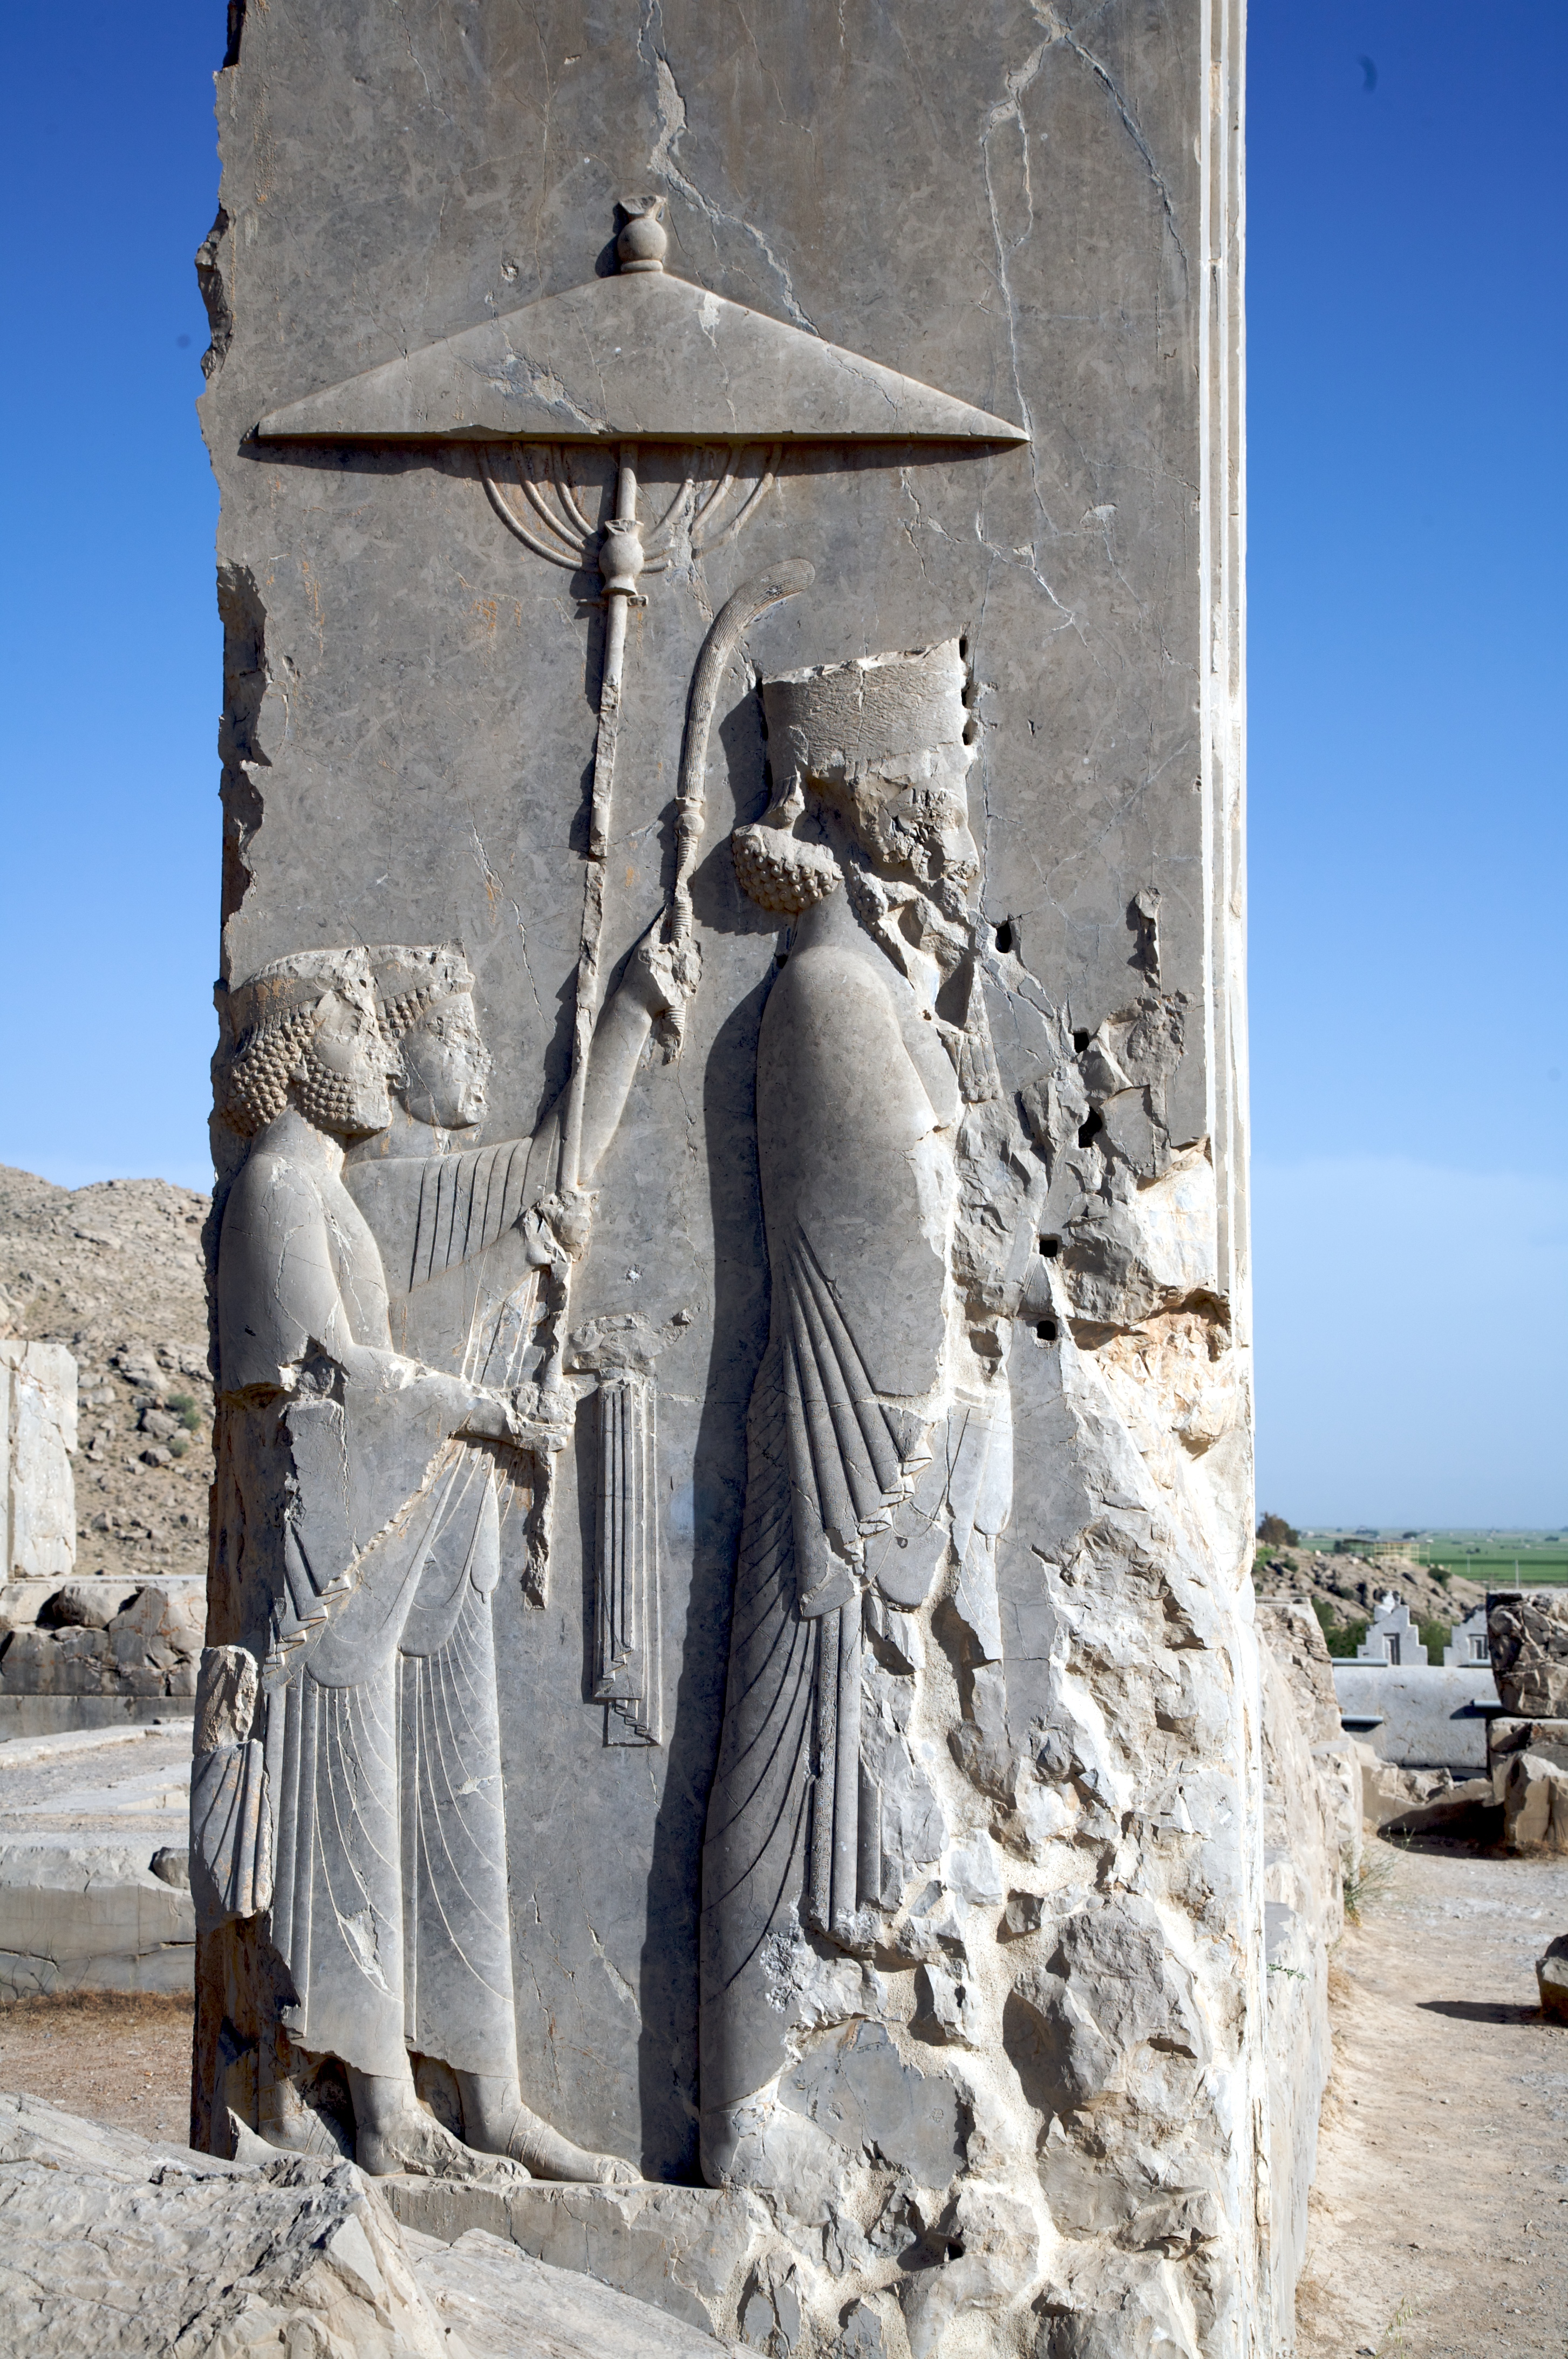 File:Persepolis, Iran (2471048564).jpg - Wikimedia Commons